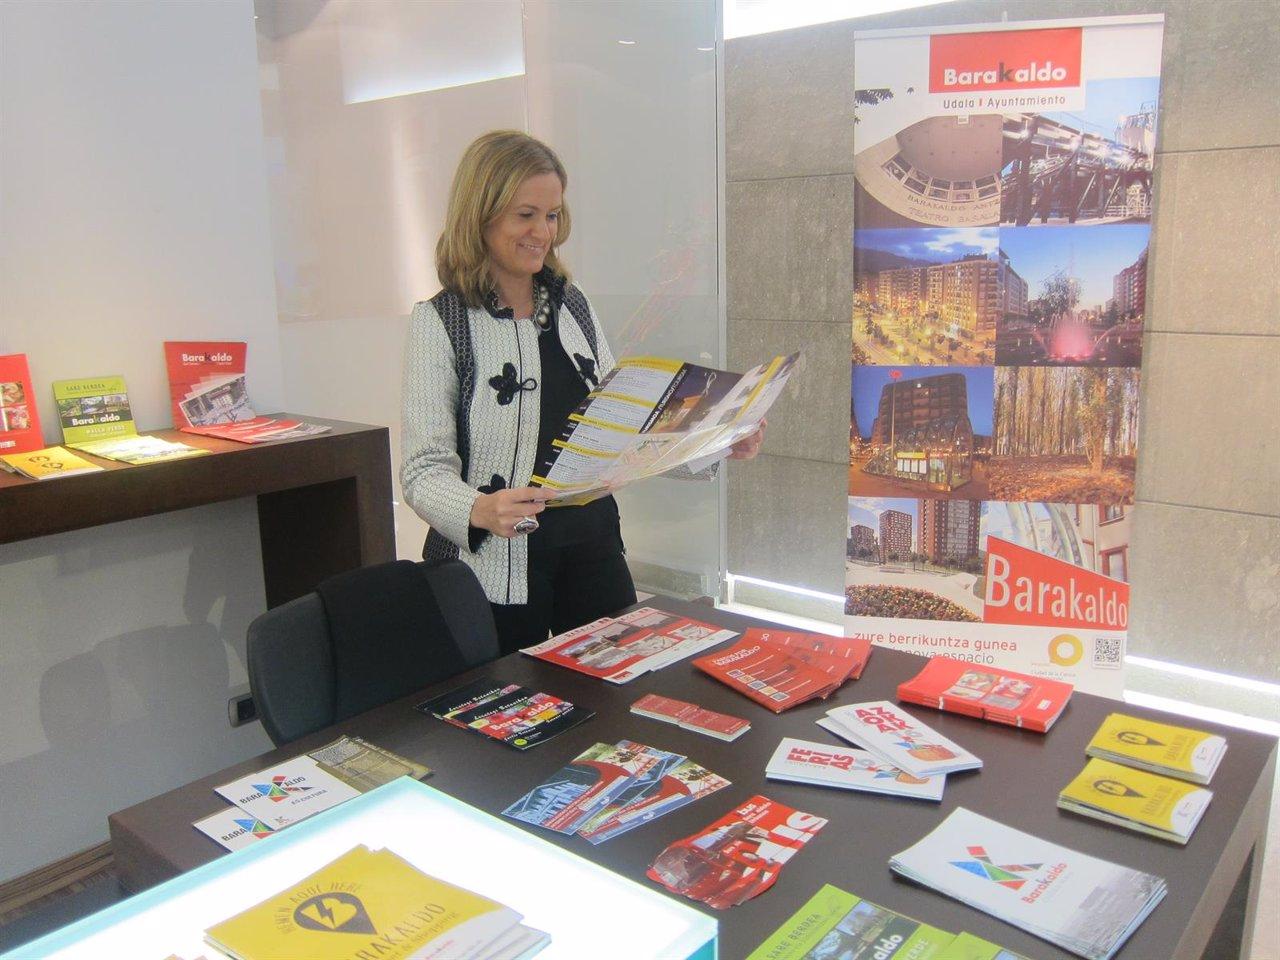 La oficina de turismo de barakaldo de bec estrena nueva imagen for Banco popular bilbao oficinas